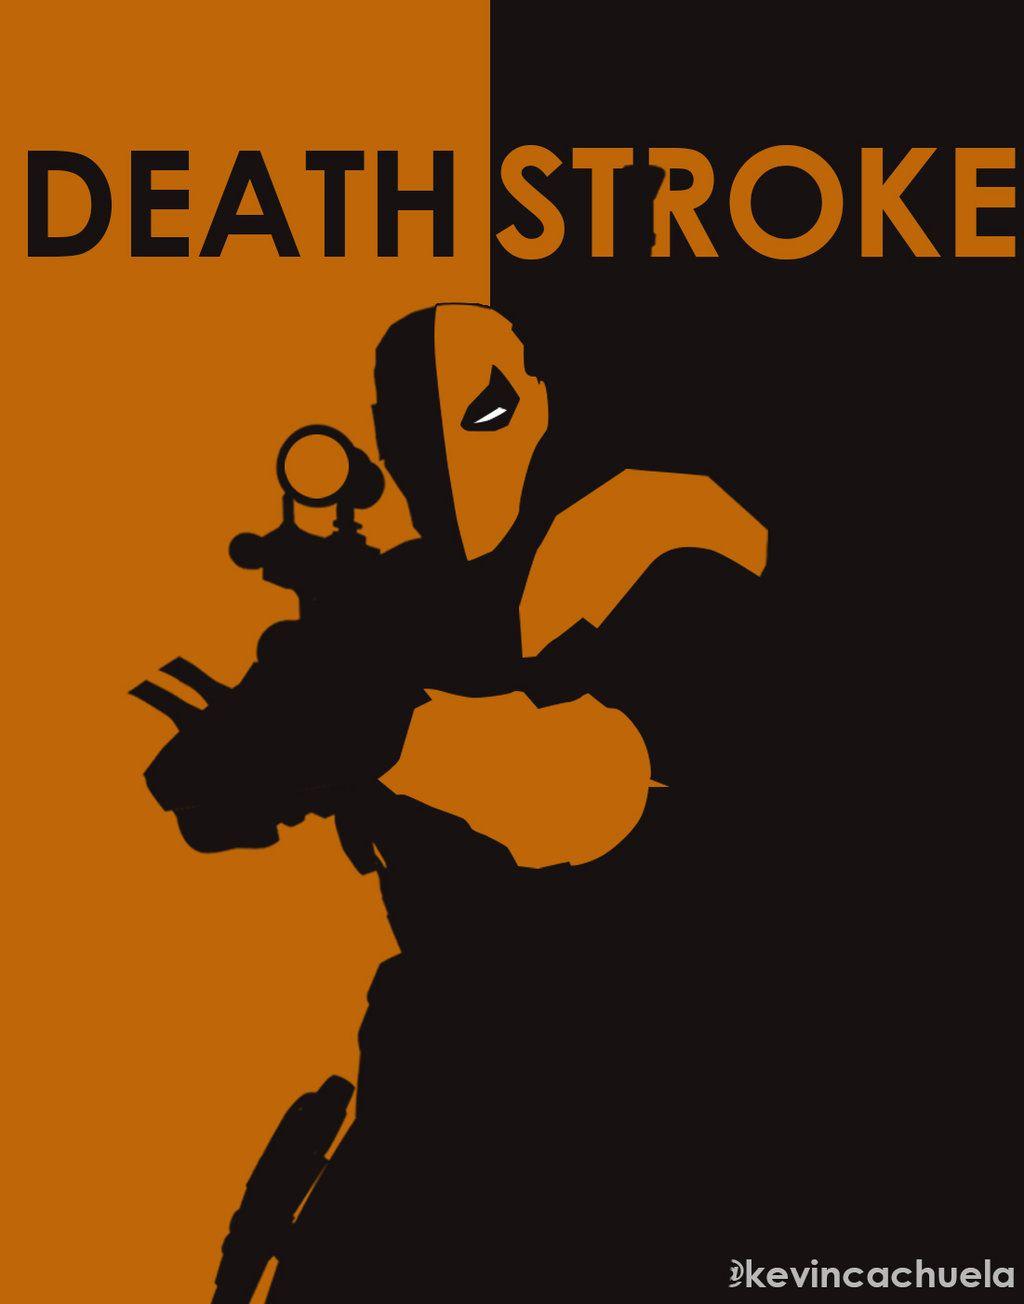 DeathStroke by kevincachuela